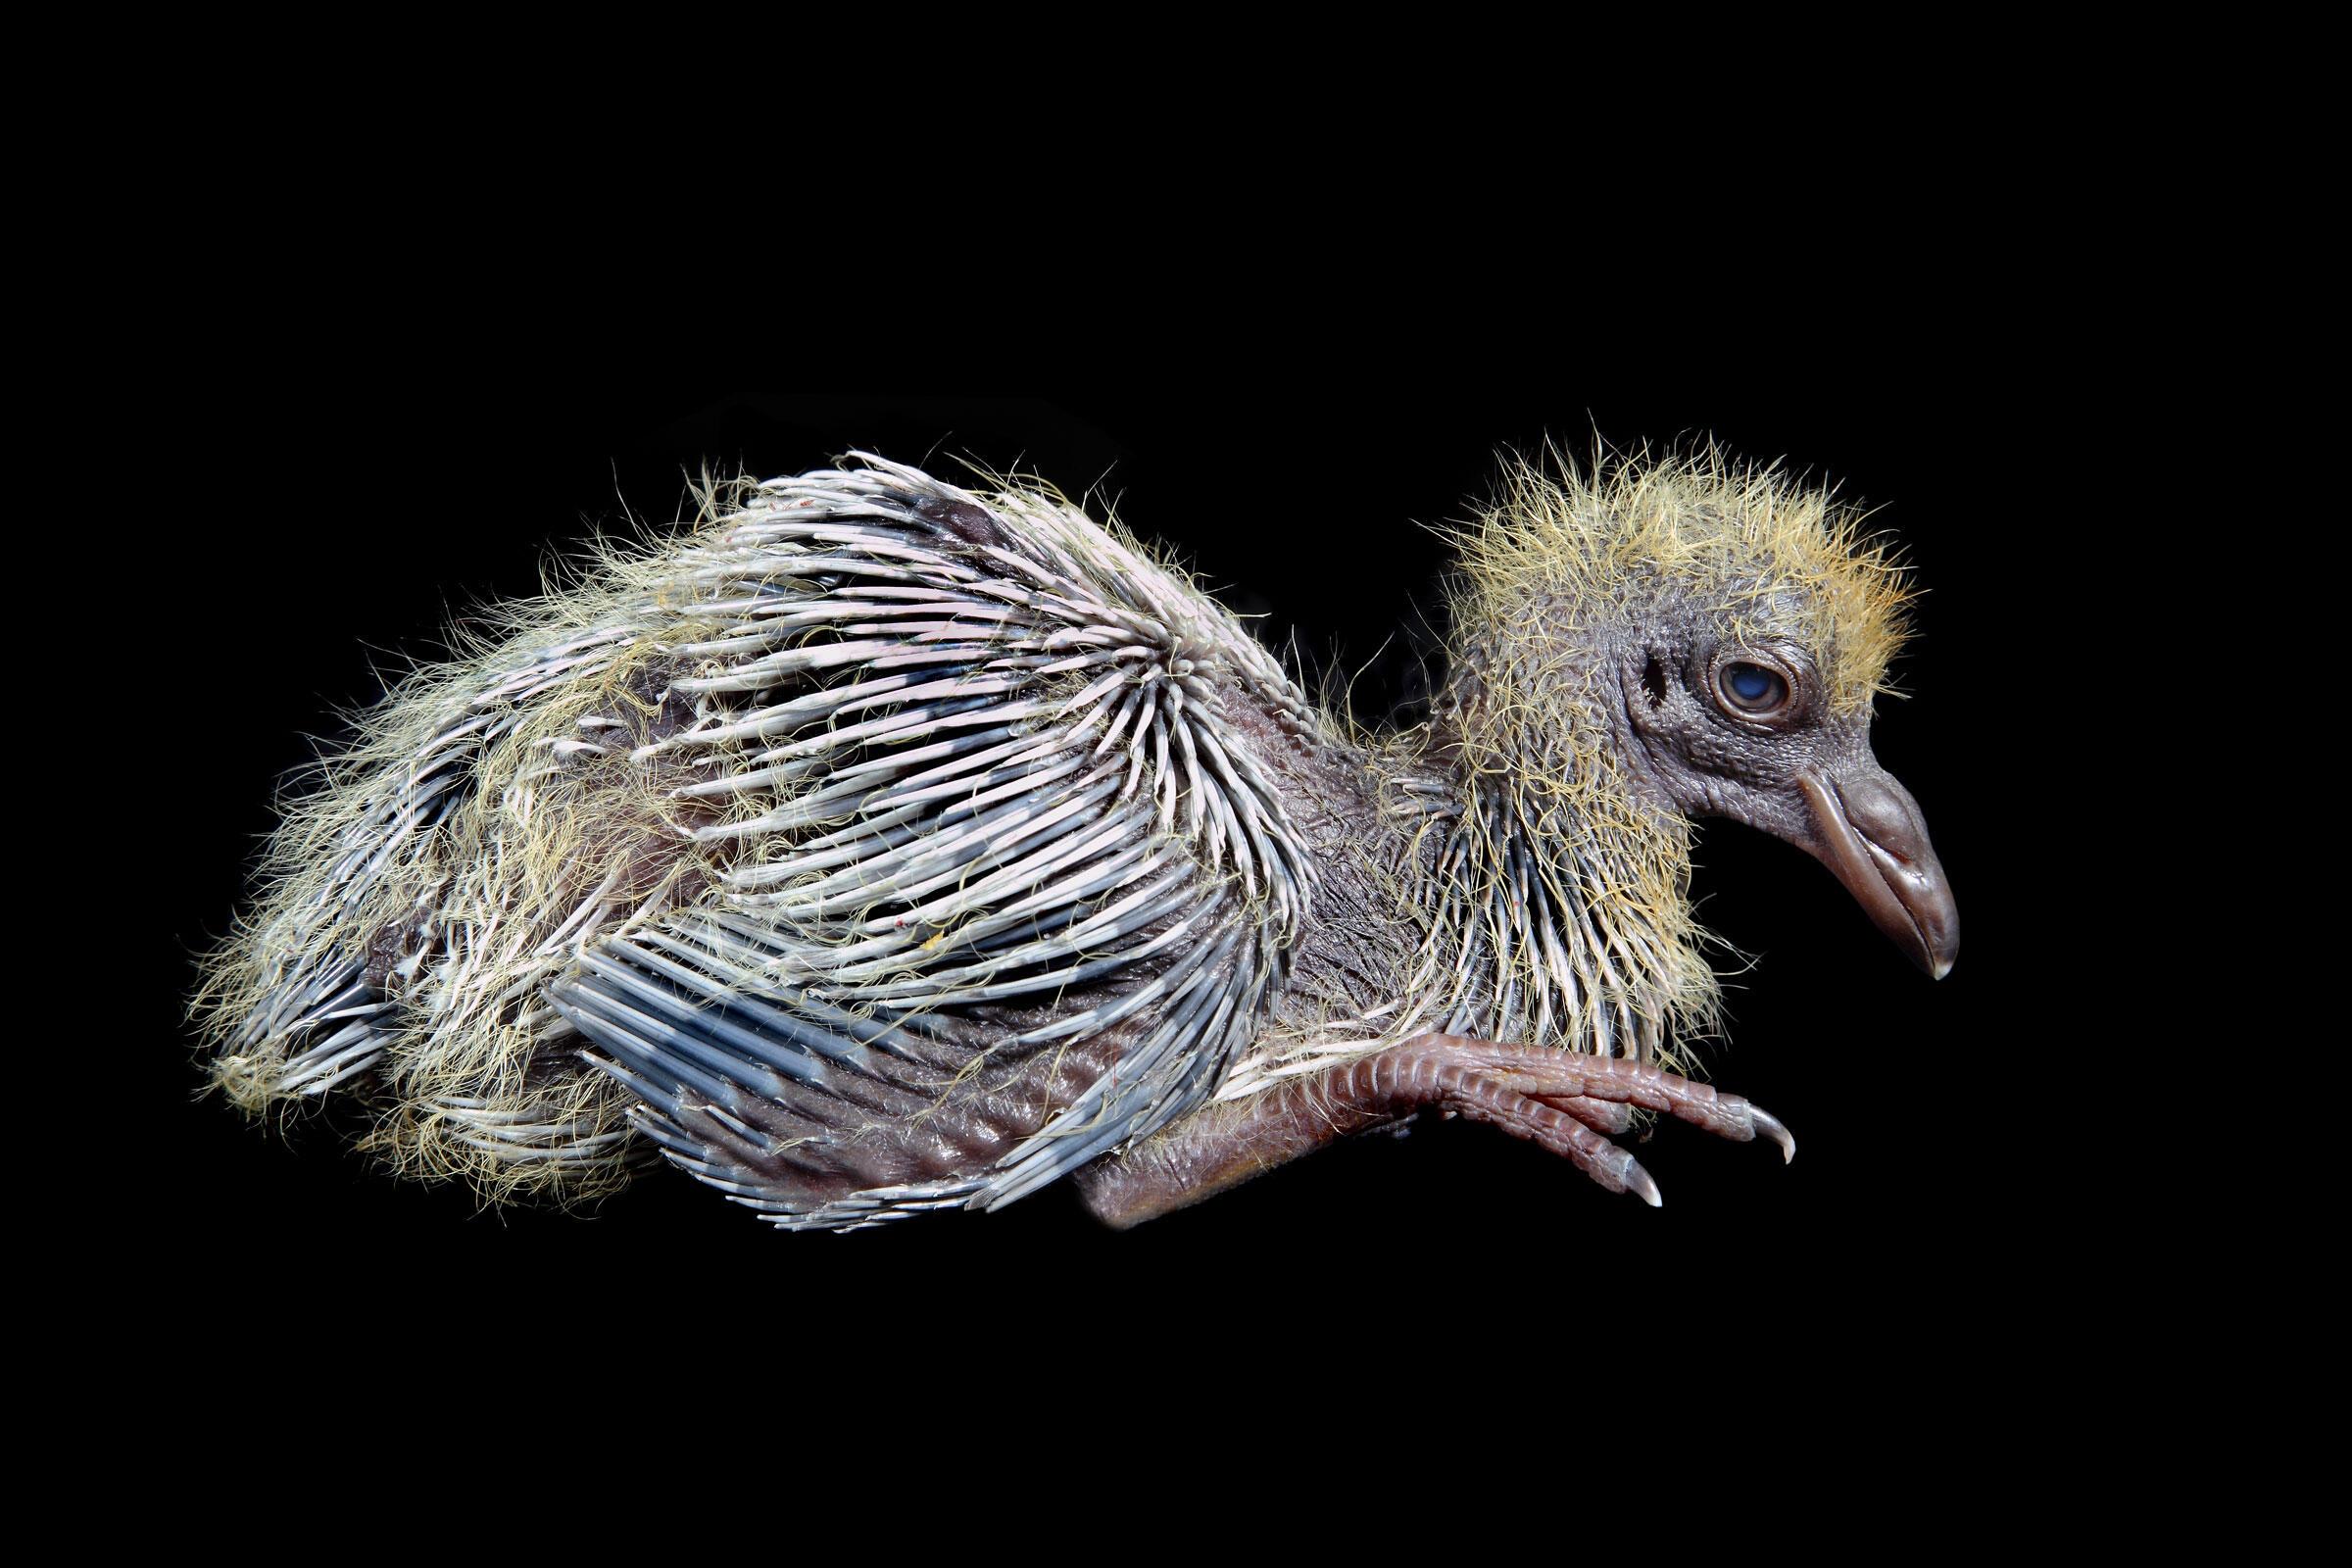 Rock Pigeon chick. Andrew Garn